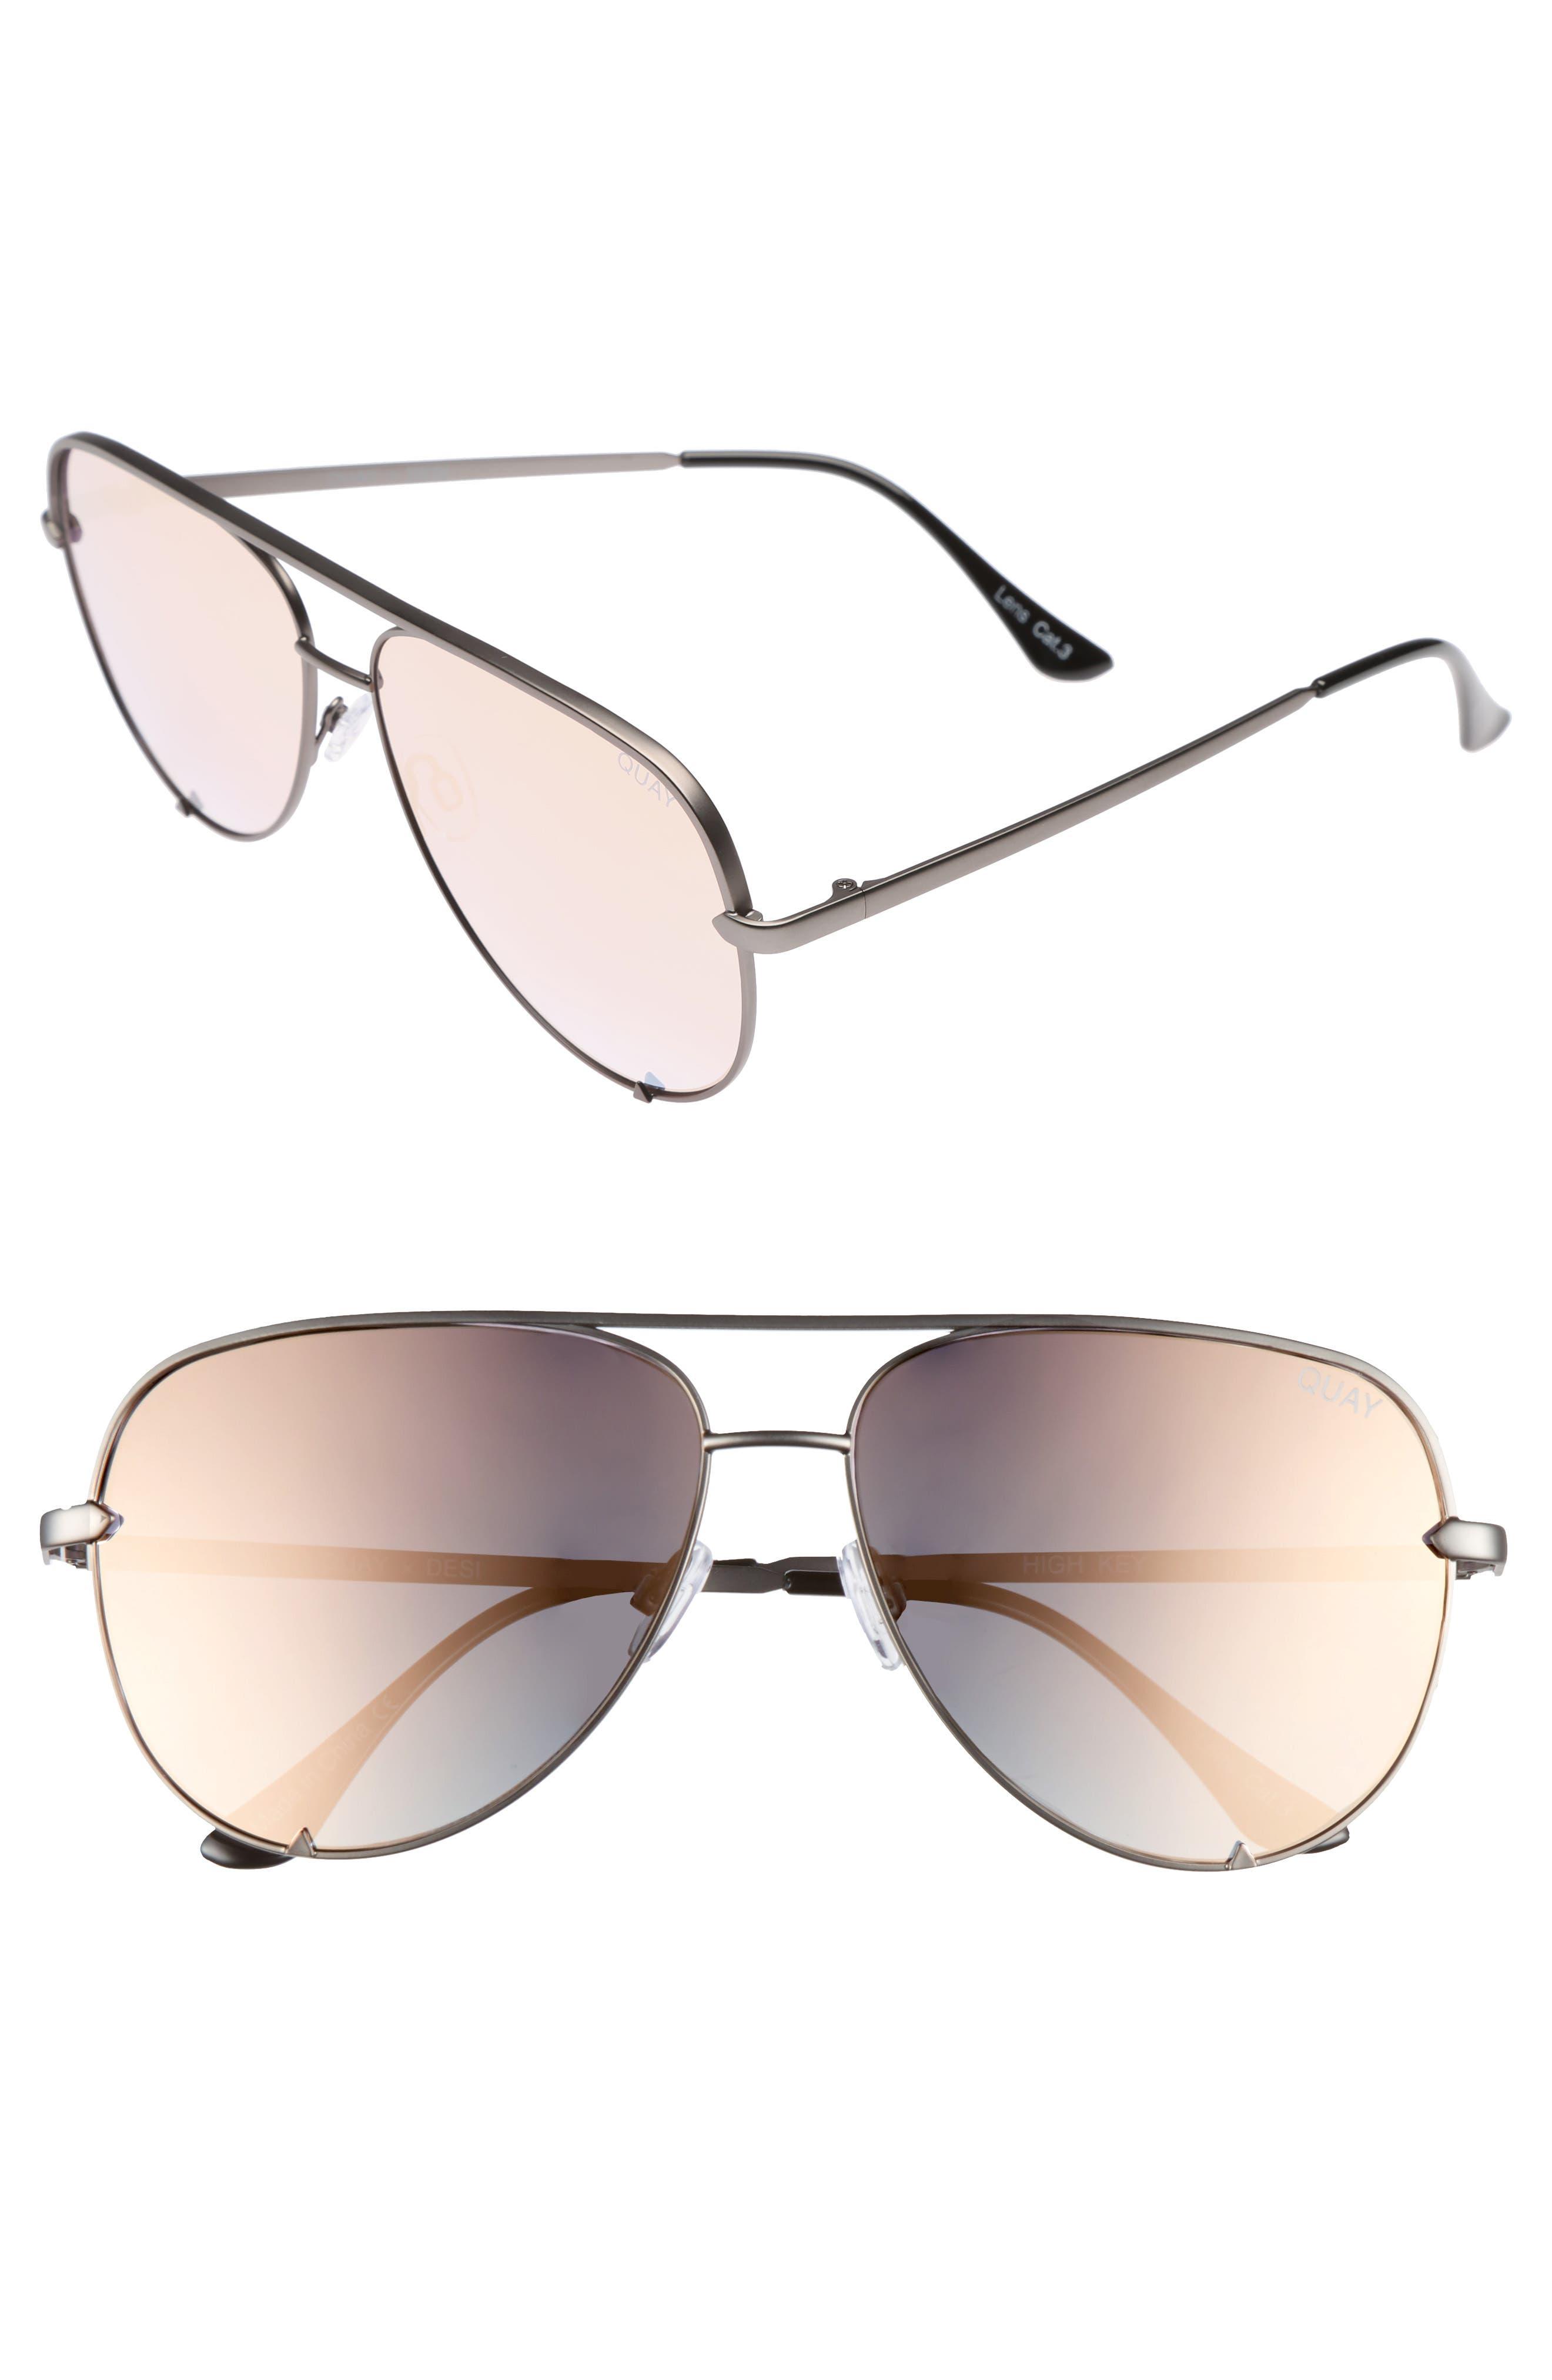 Quay Australia x Desi Perkins High Key 60mm Aviator Sunglasses